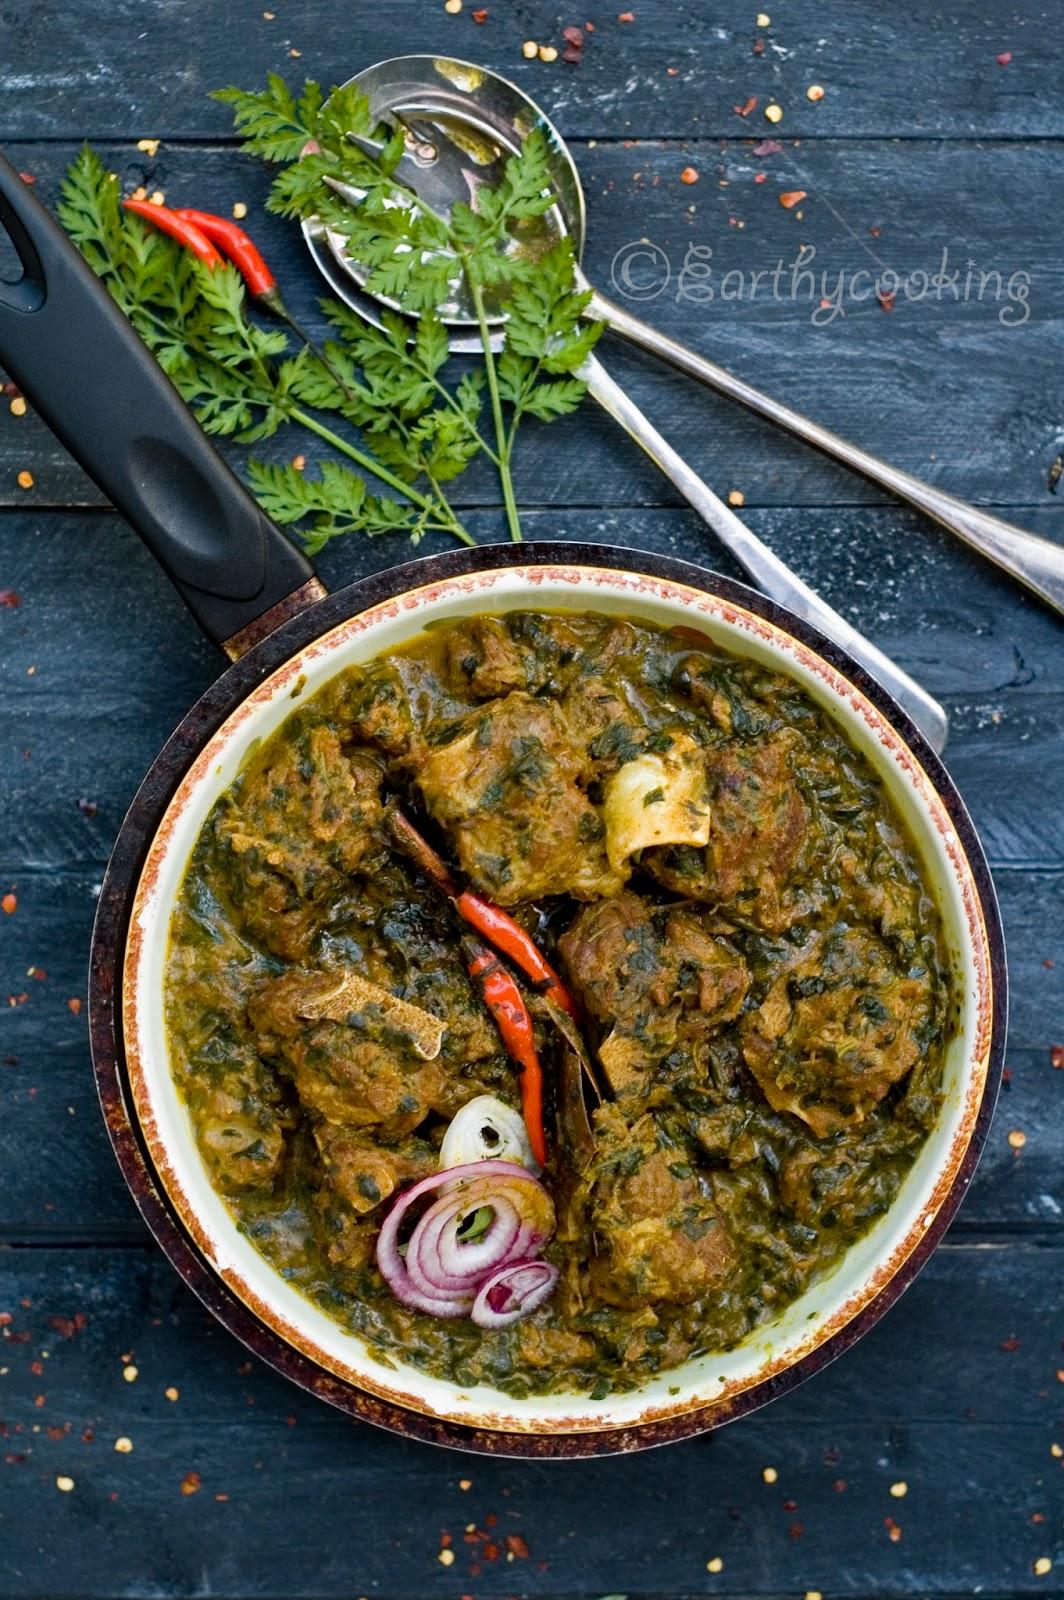 Earthycooking : Lamb Saagwala/Lamb Curry with Spinach Pesto